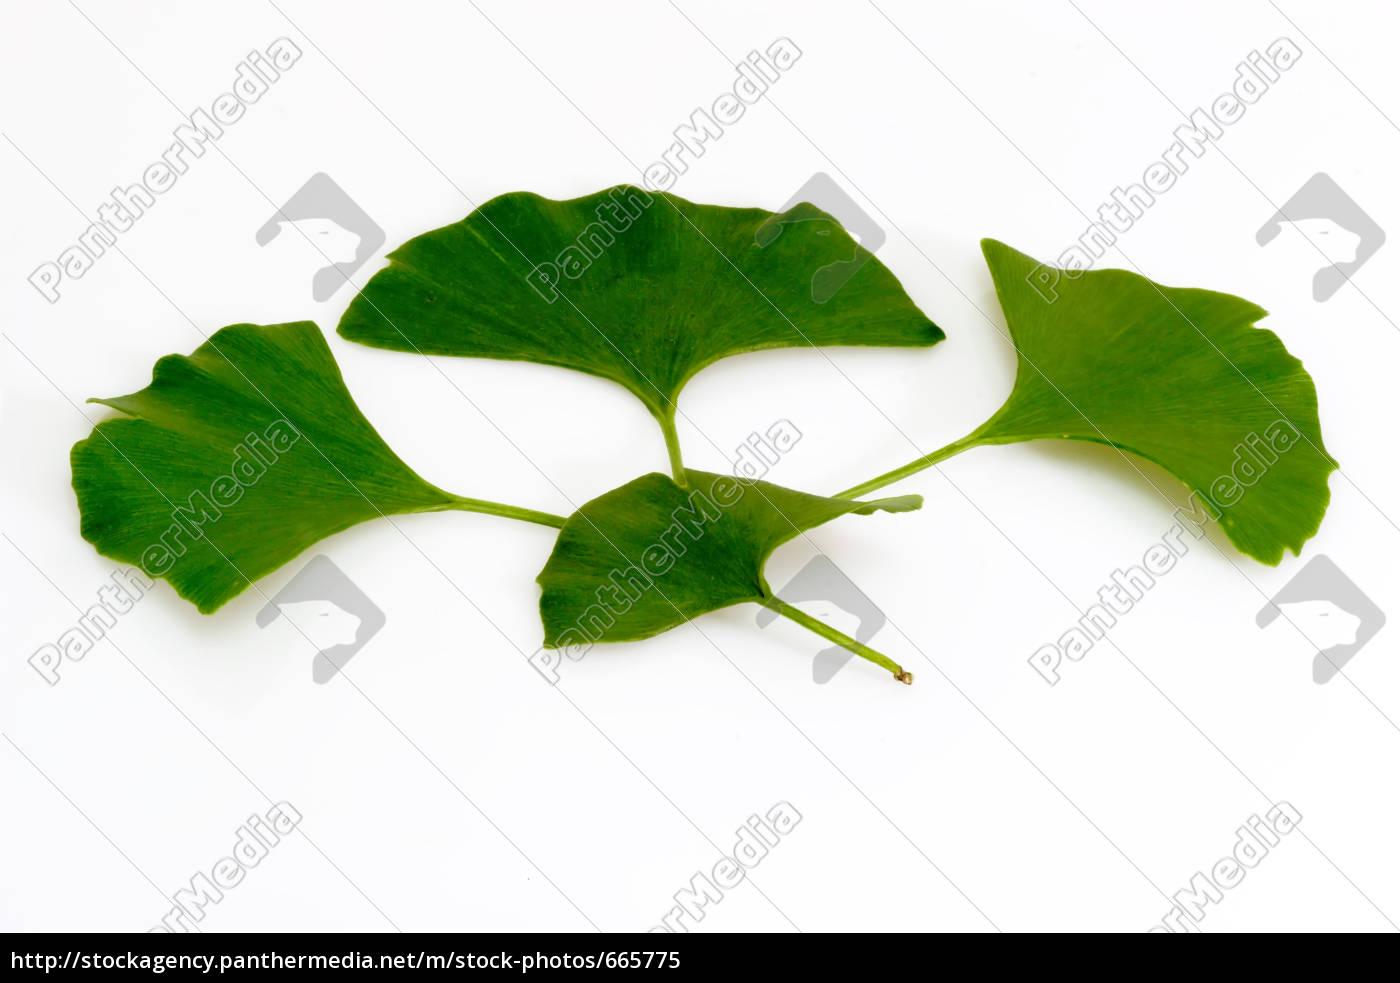 gingko, leaves - 665775